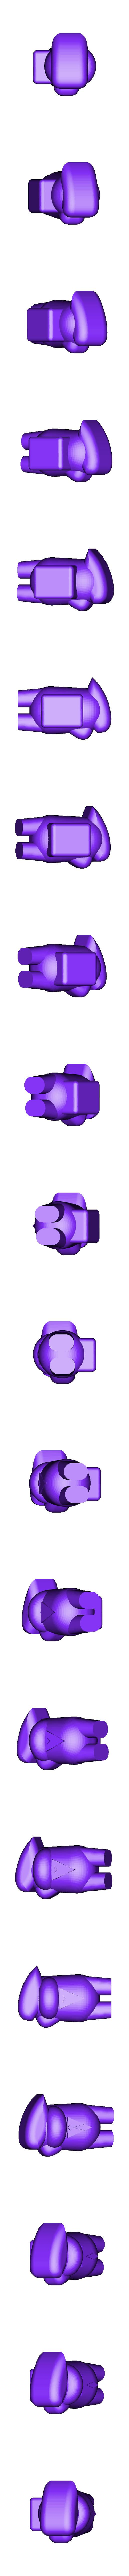 MR PRESIDENT.stl Download STL file pack 3 of 10 AMONG US + AMONG EXCLUSIVE MR PRESIDENT • 3D printable design, sebastiancabral719